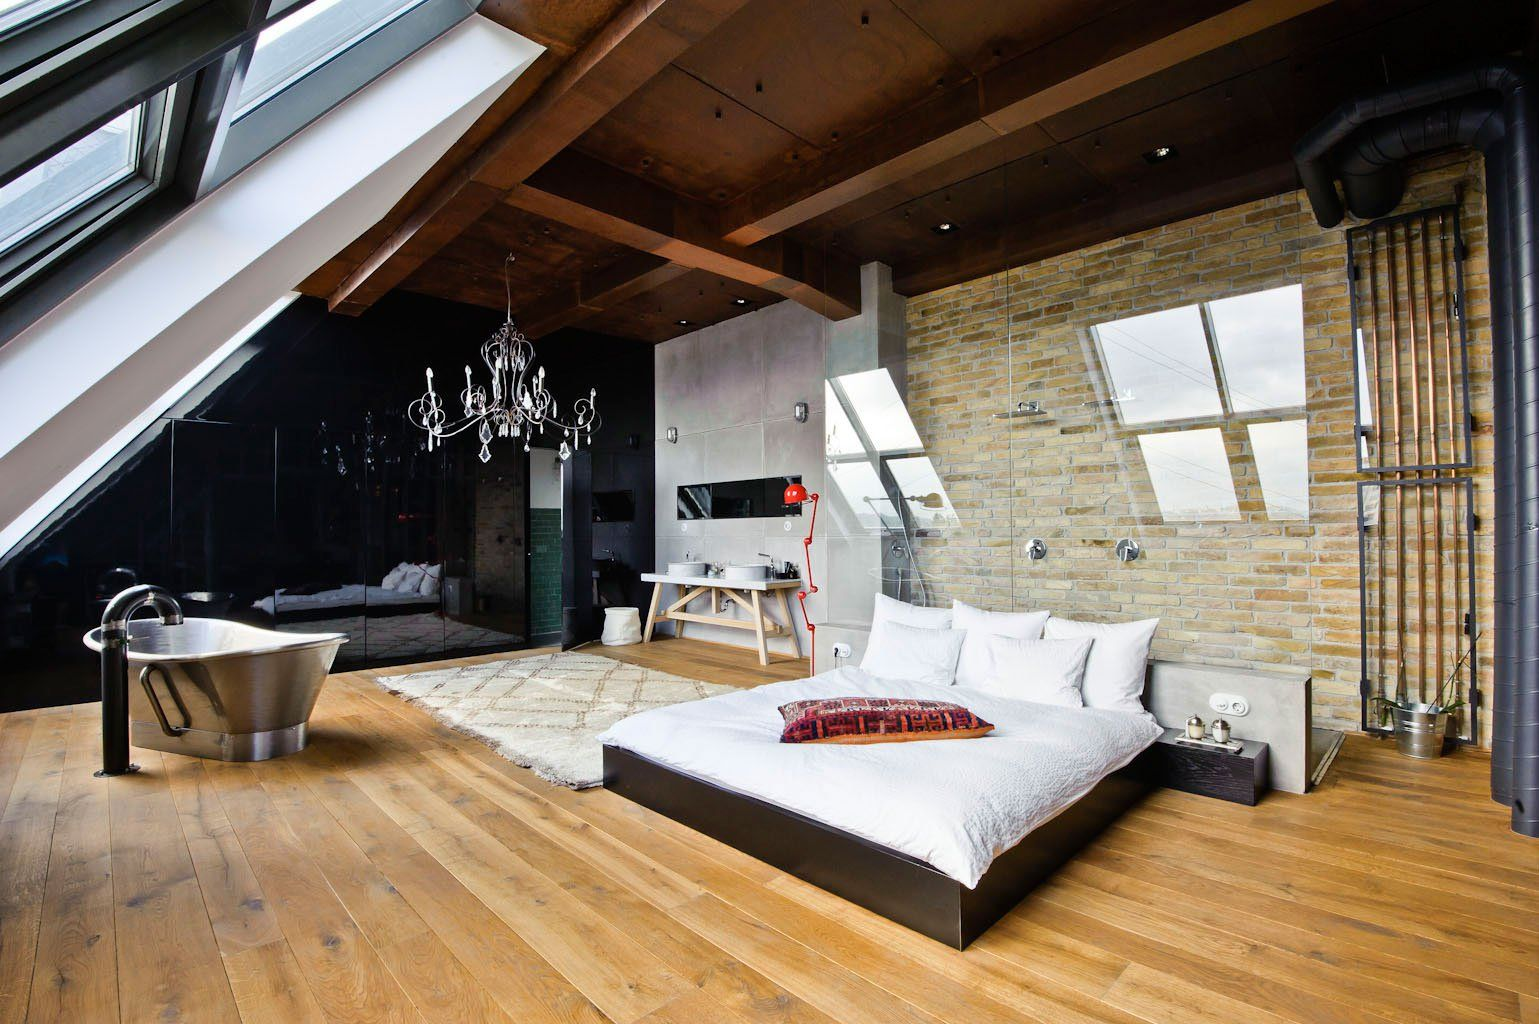 4 bedroom loft  EclecticApartmentBudapest  Bedrooms  Pinterest  Budapest